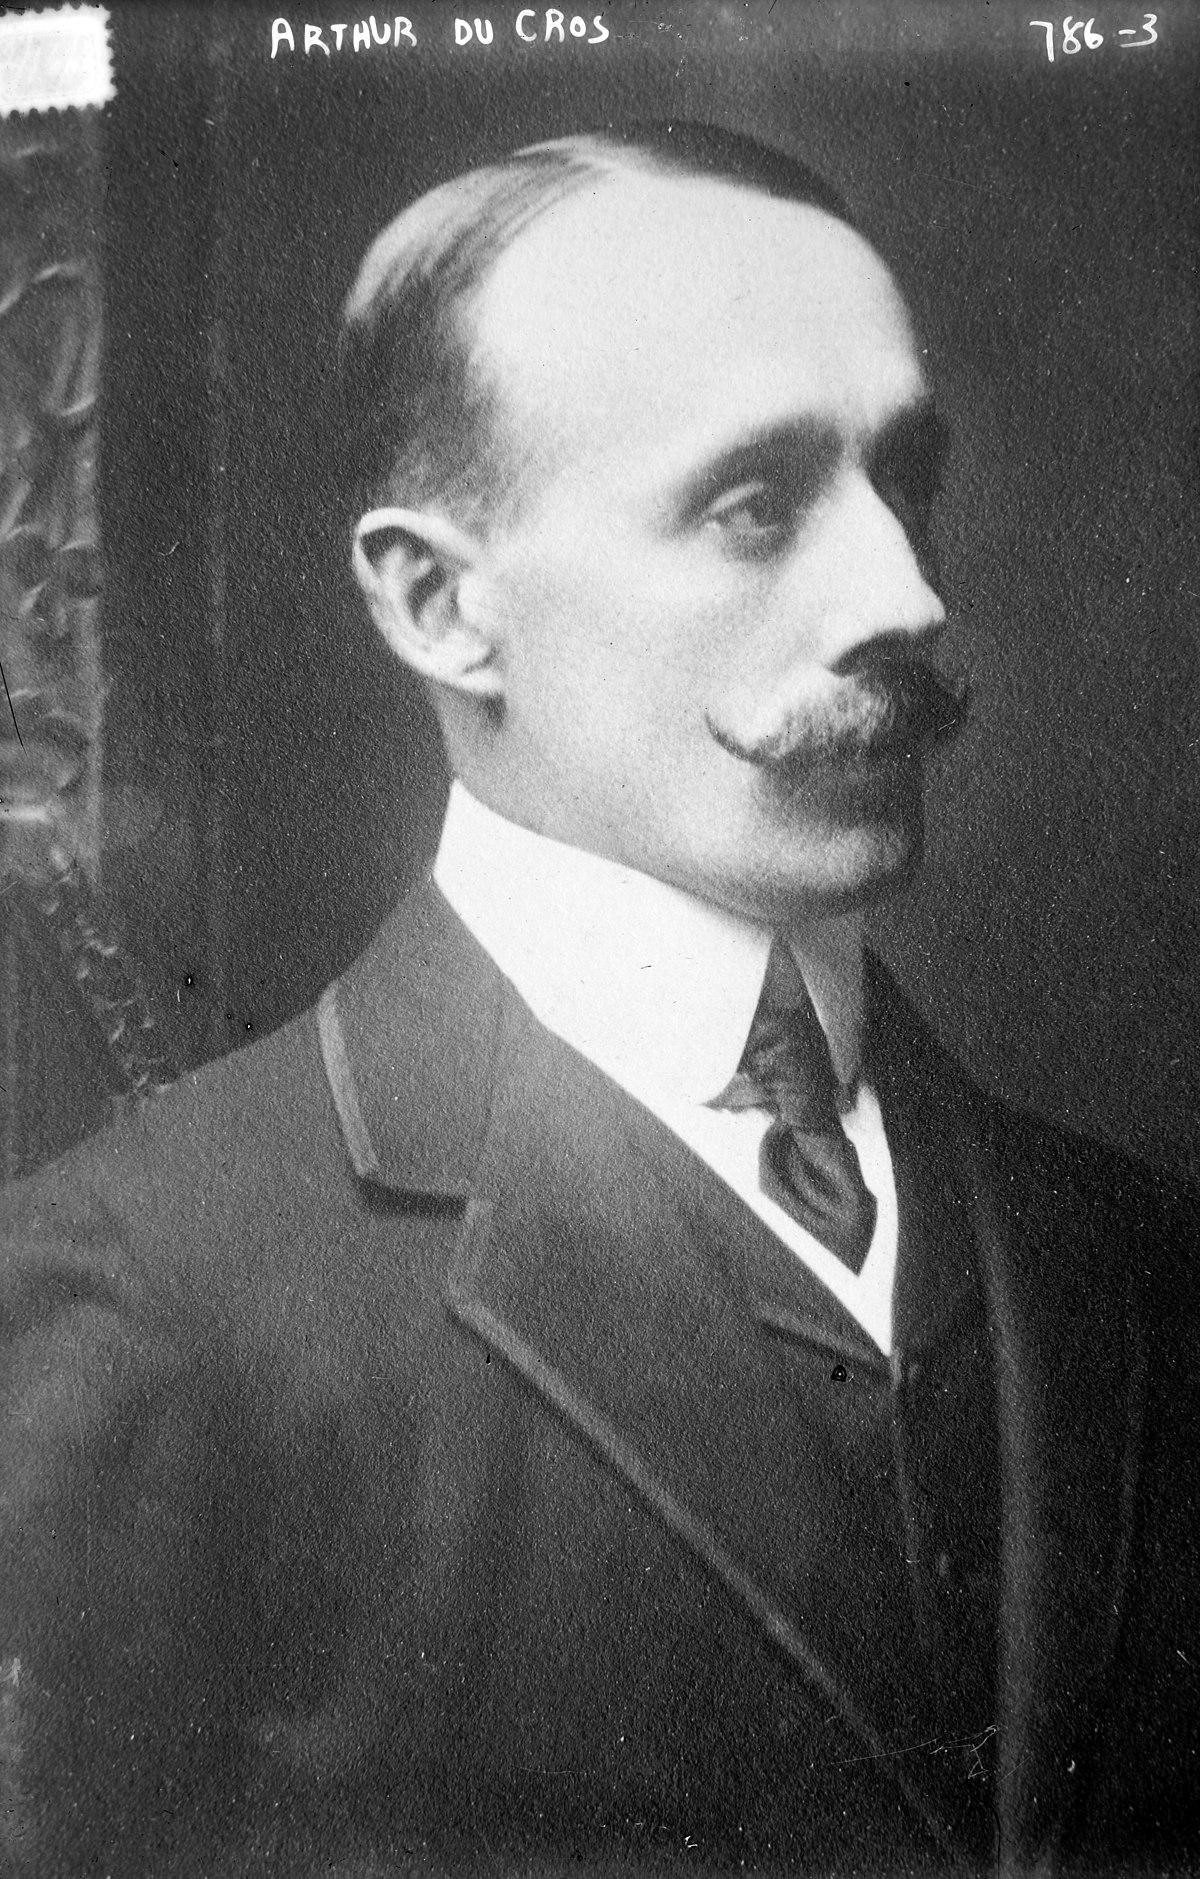 Arthur Du Cros Wikipedia